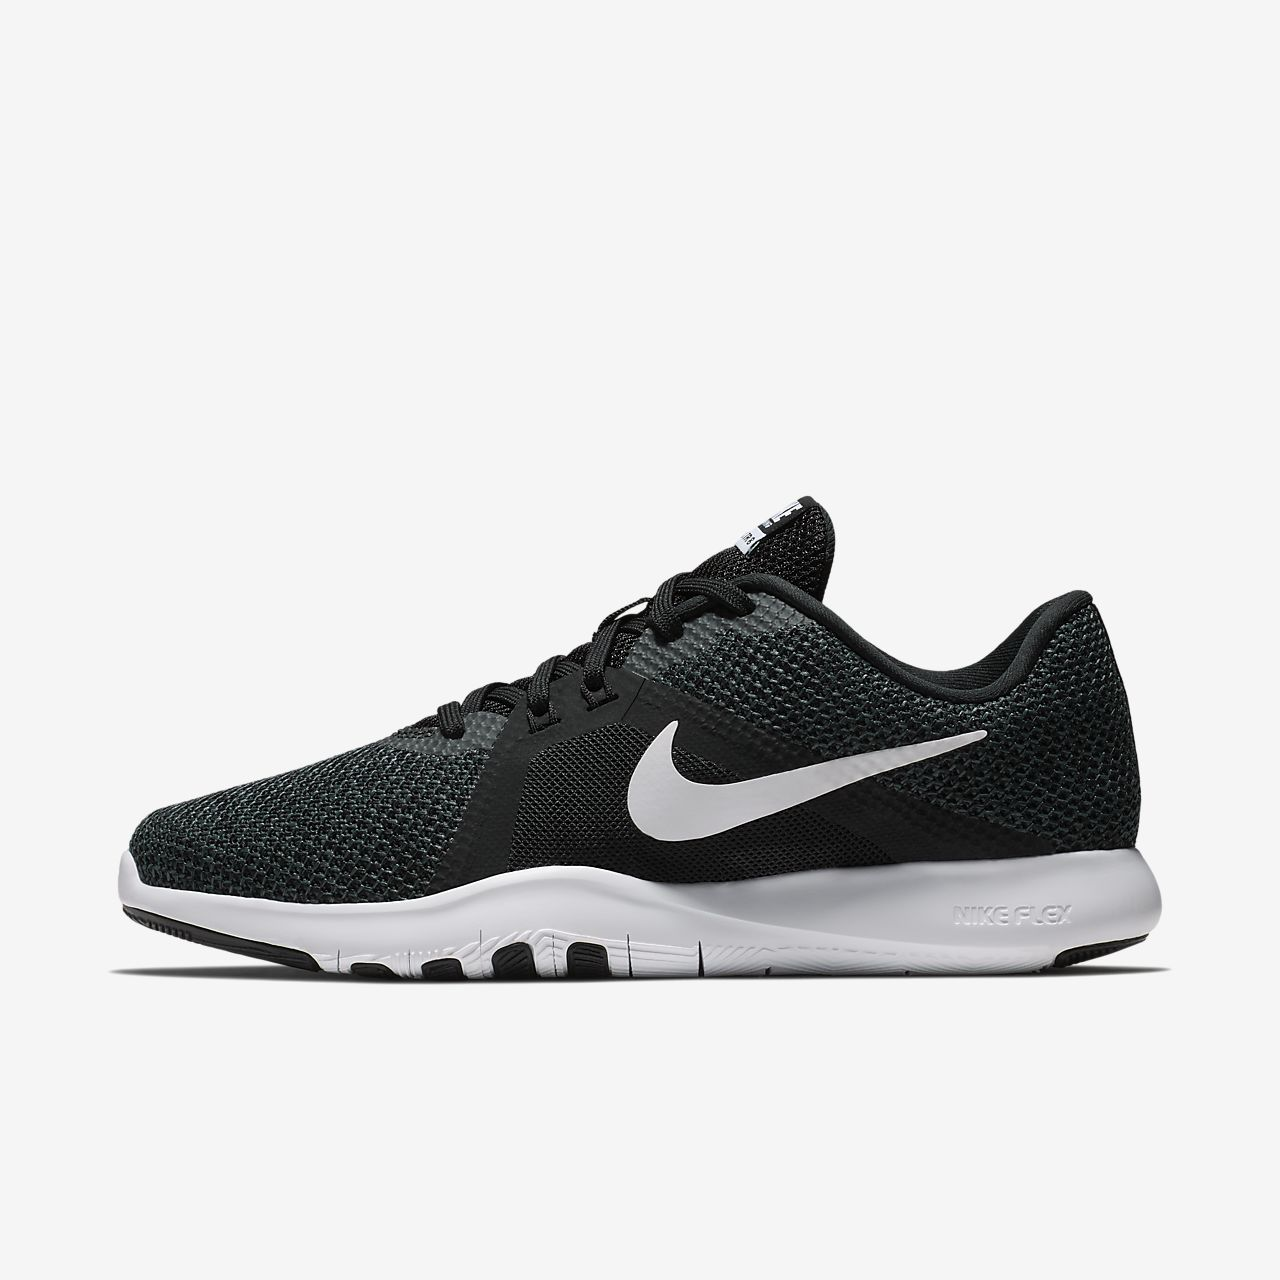 Chaussure Pour De Nike Fr Training Tr8 Flex Femme qwqrXgf